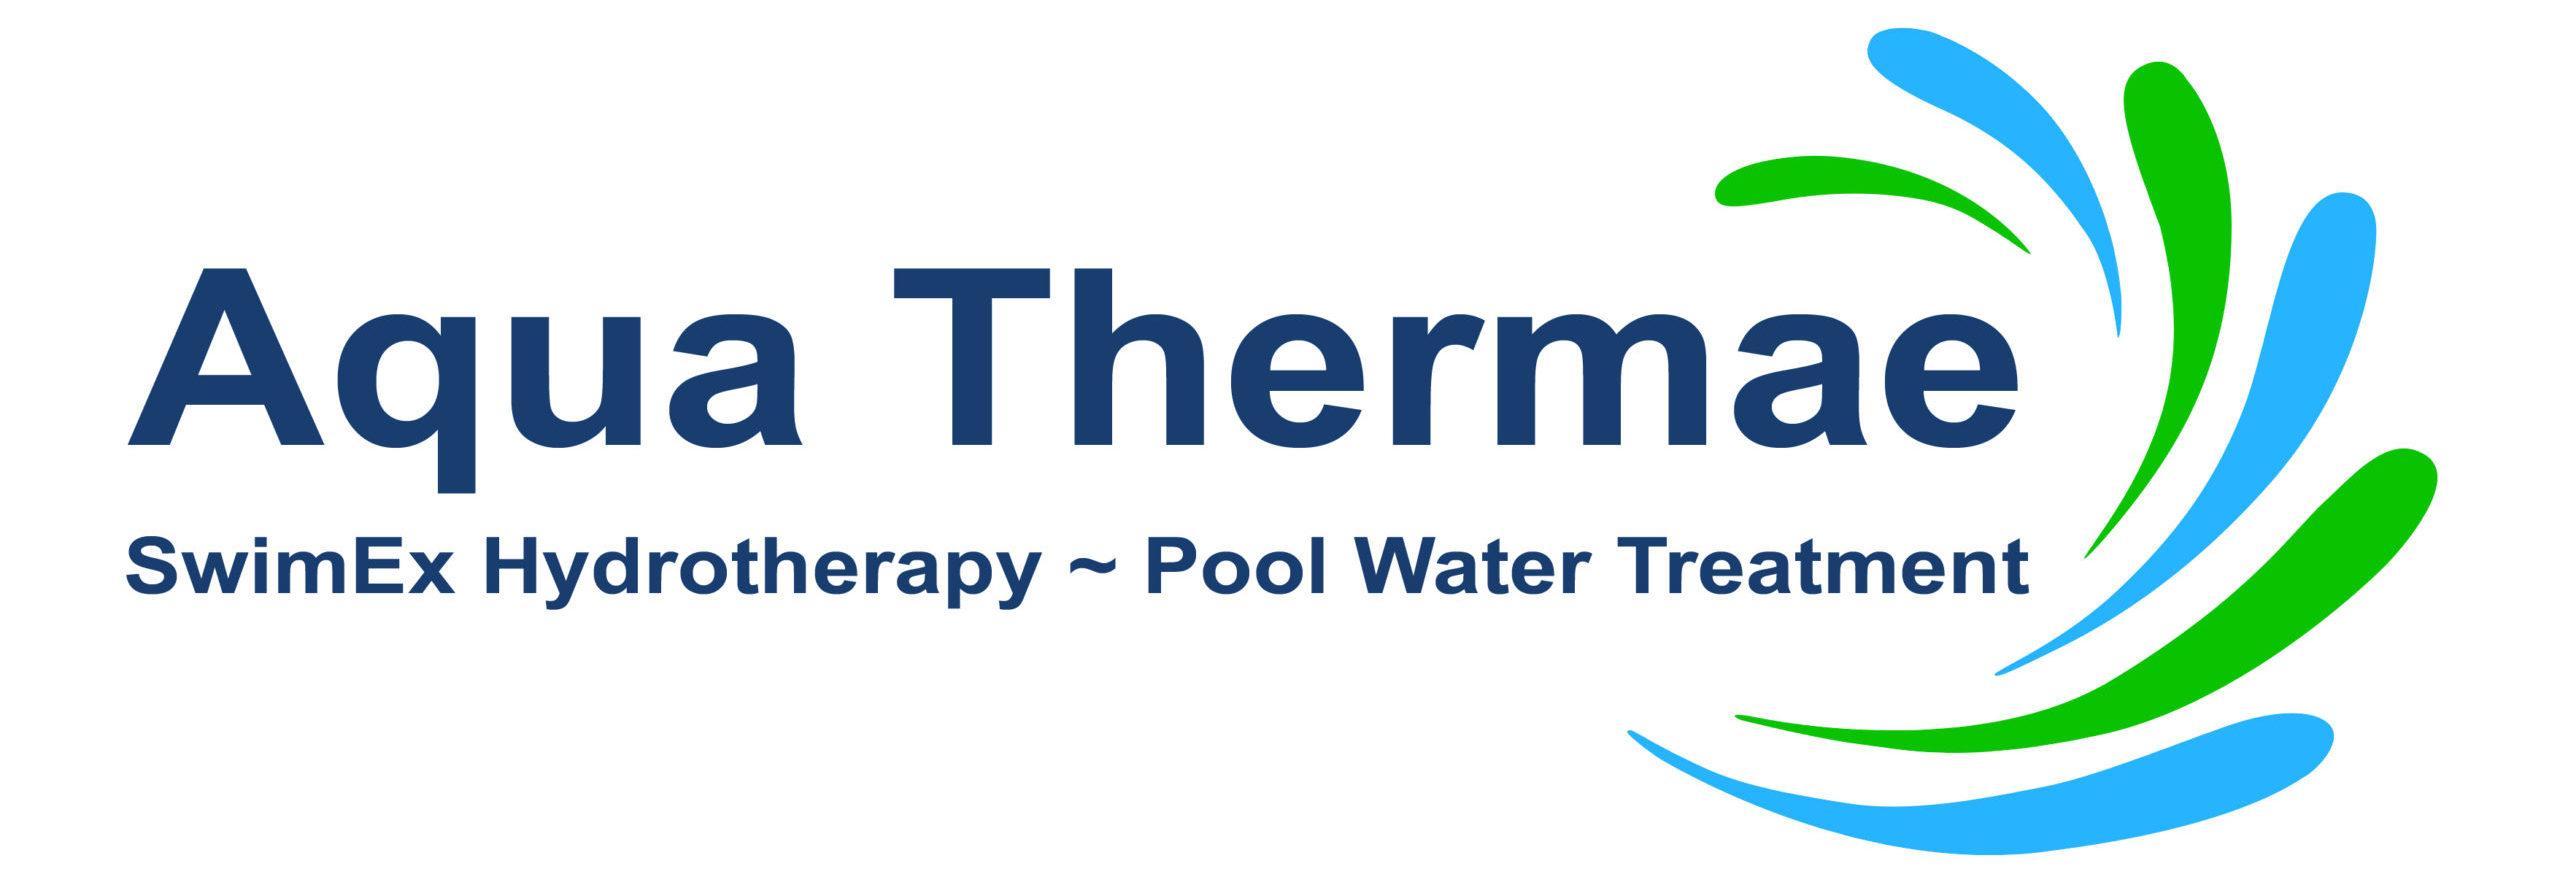 Aqua Thermae